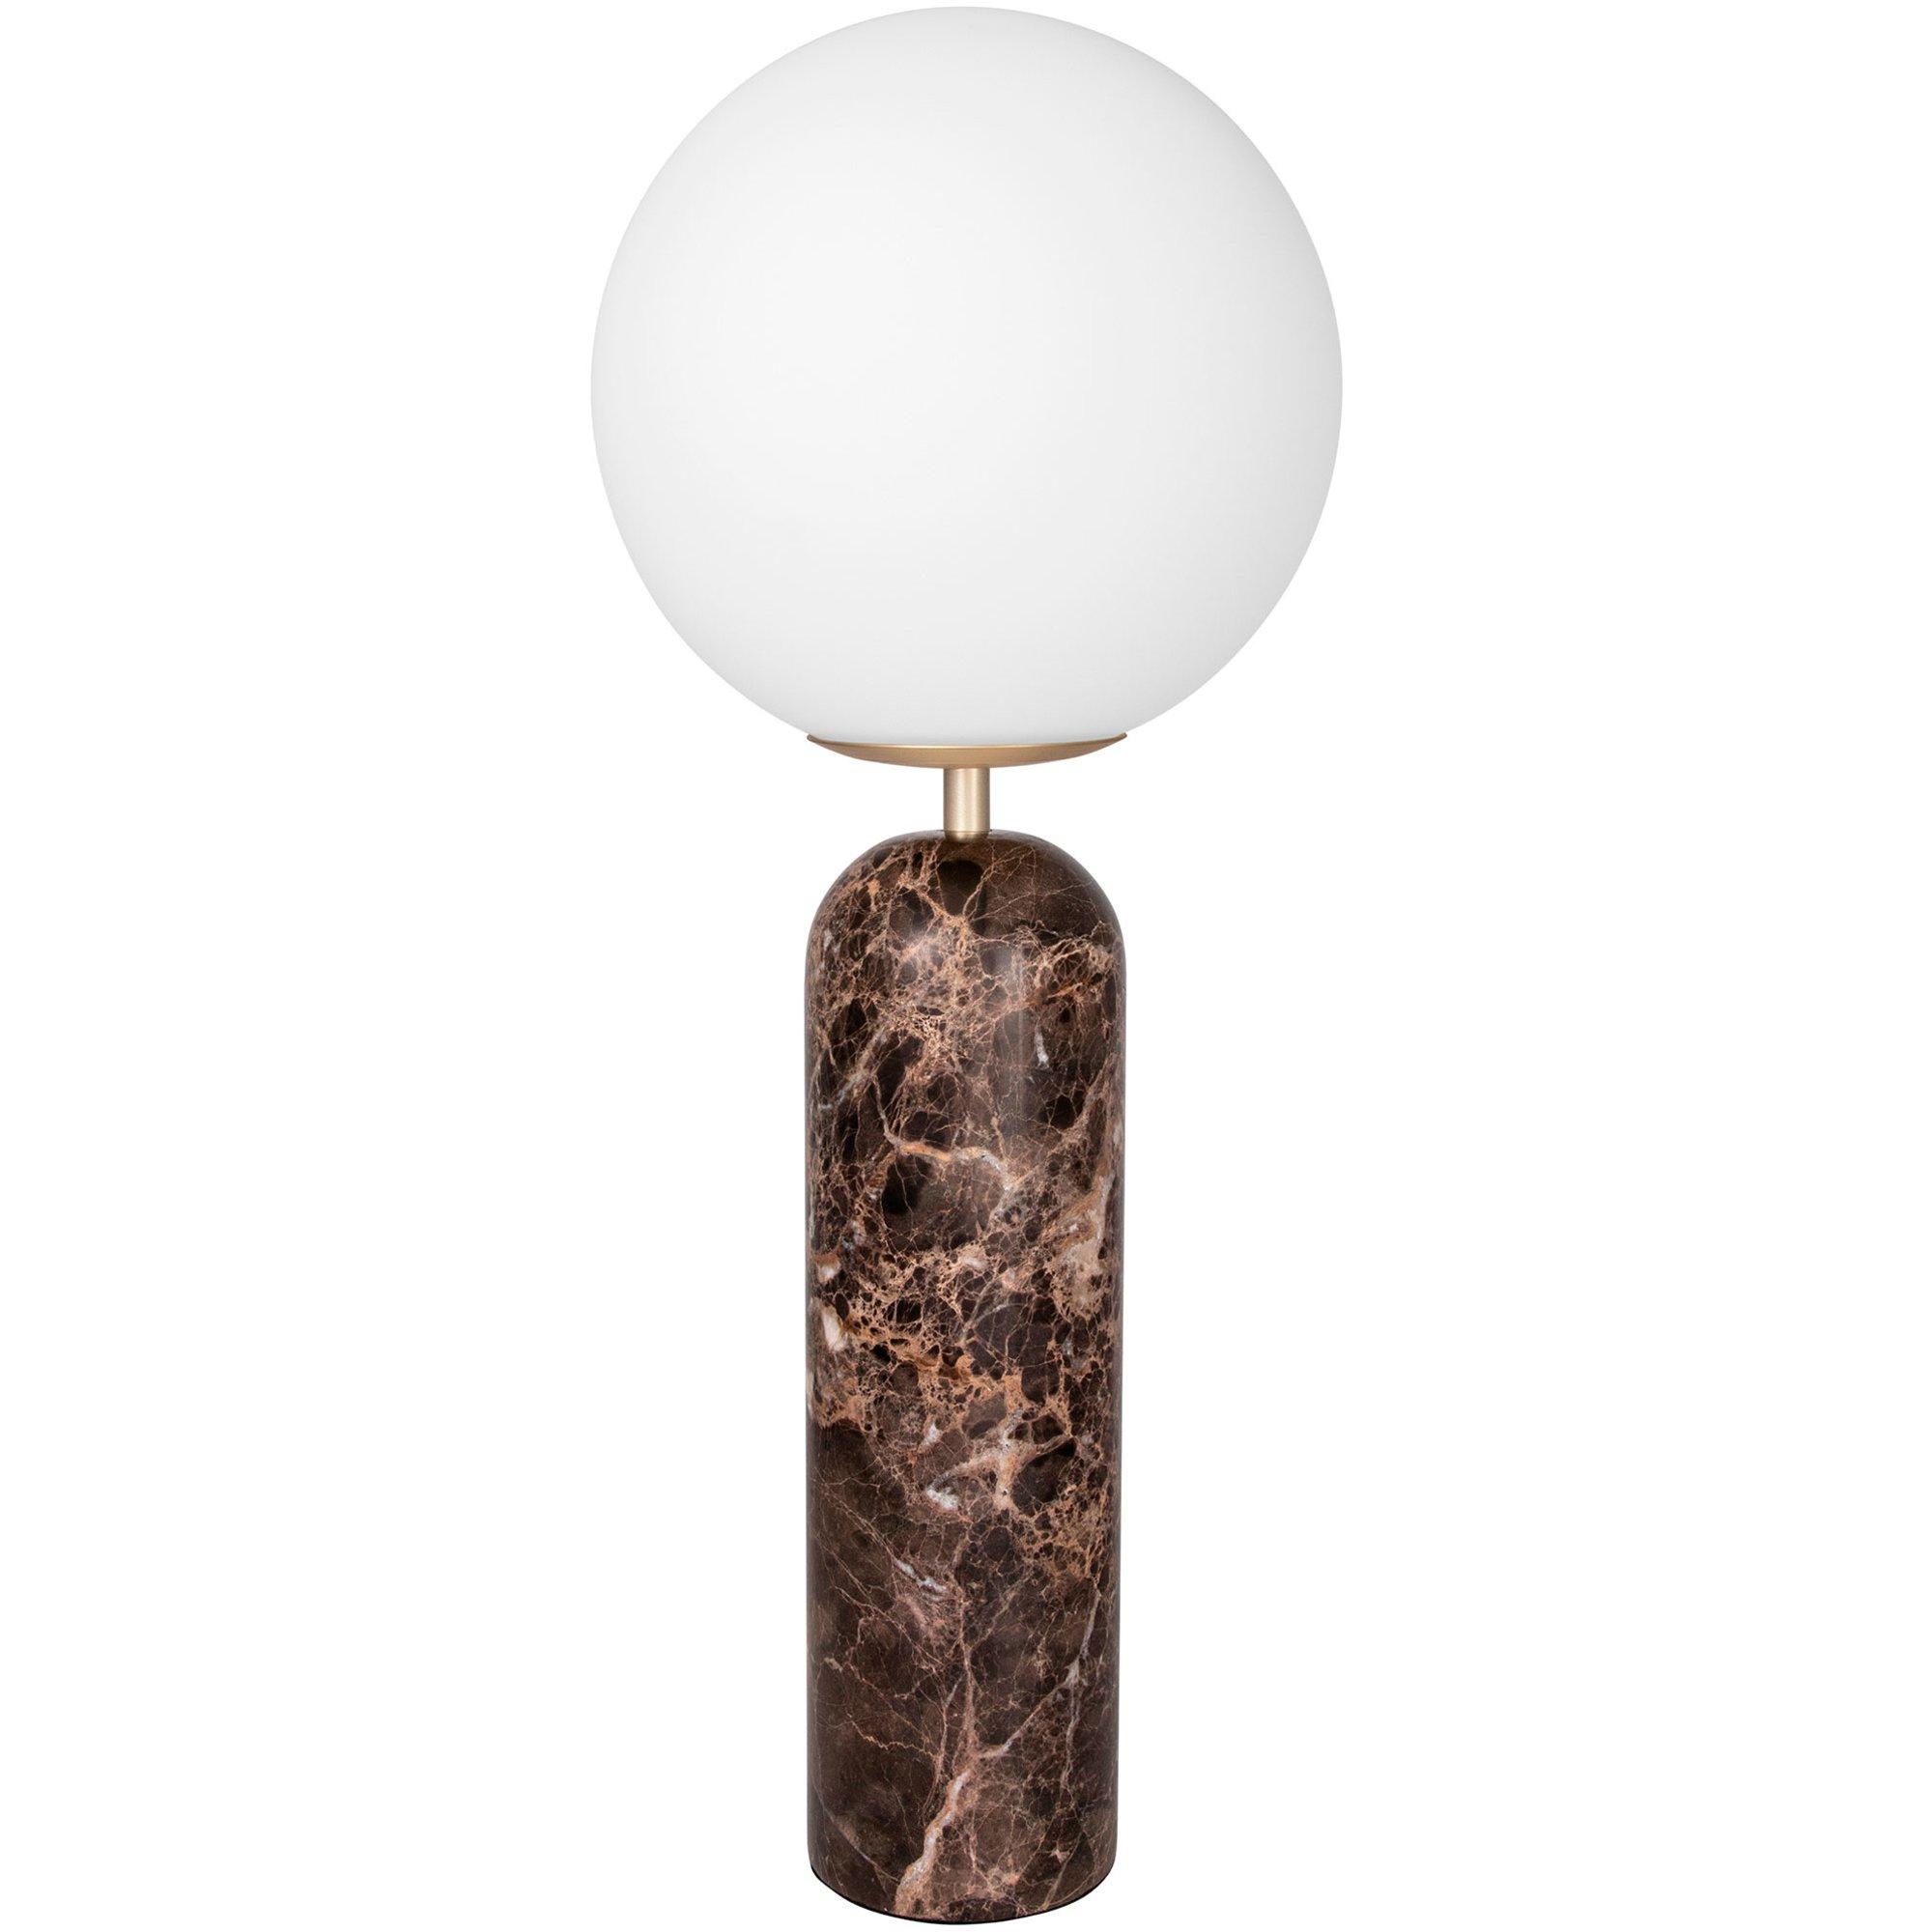 Globen Lighting Torrano Bordslampa brun